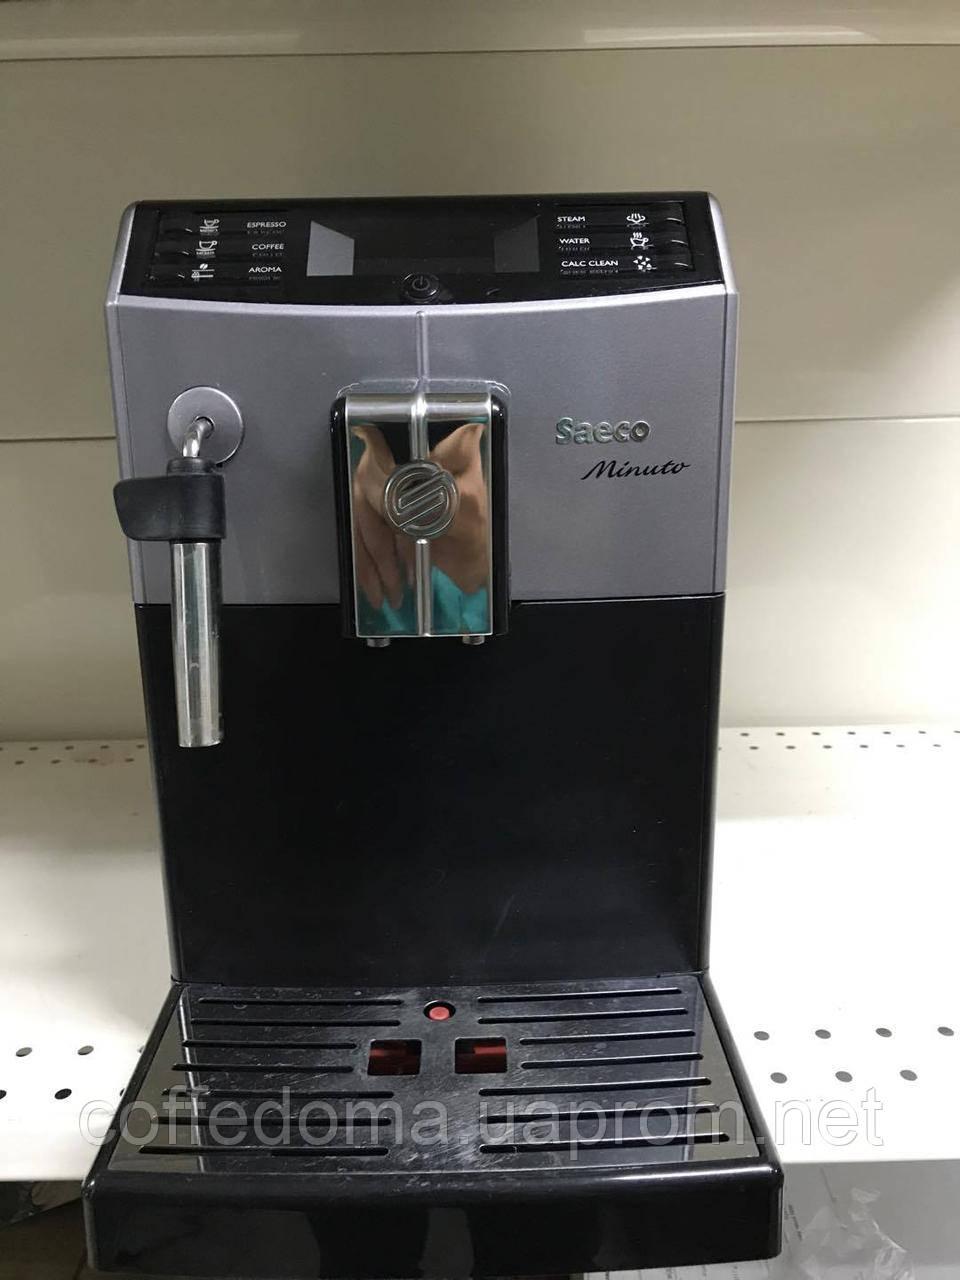 Saeco HD8861 Minuto автоматическая кофемашина